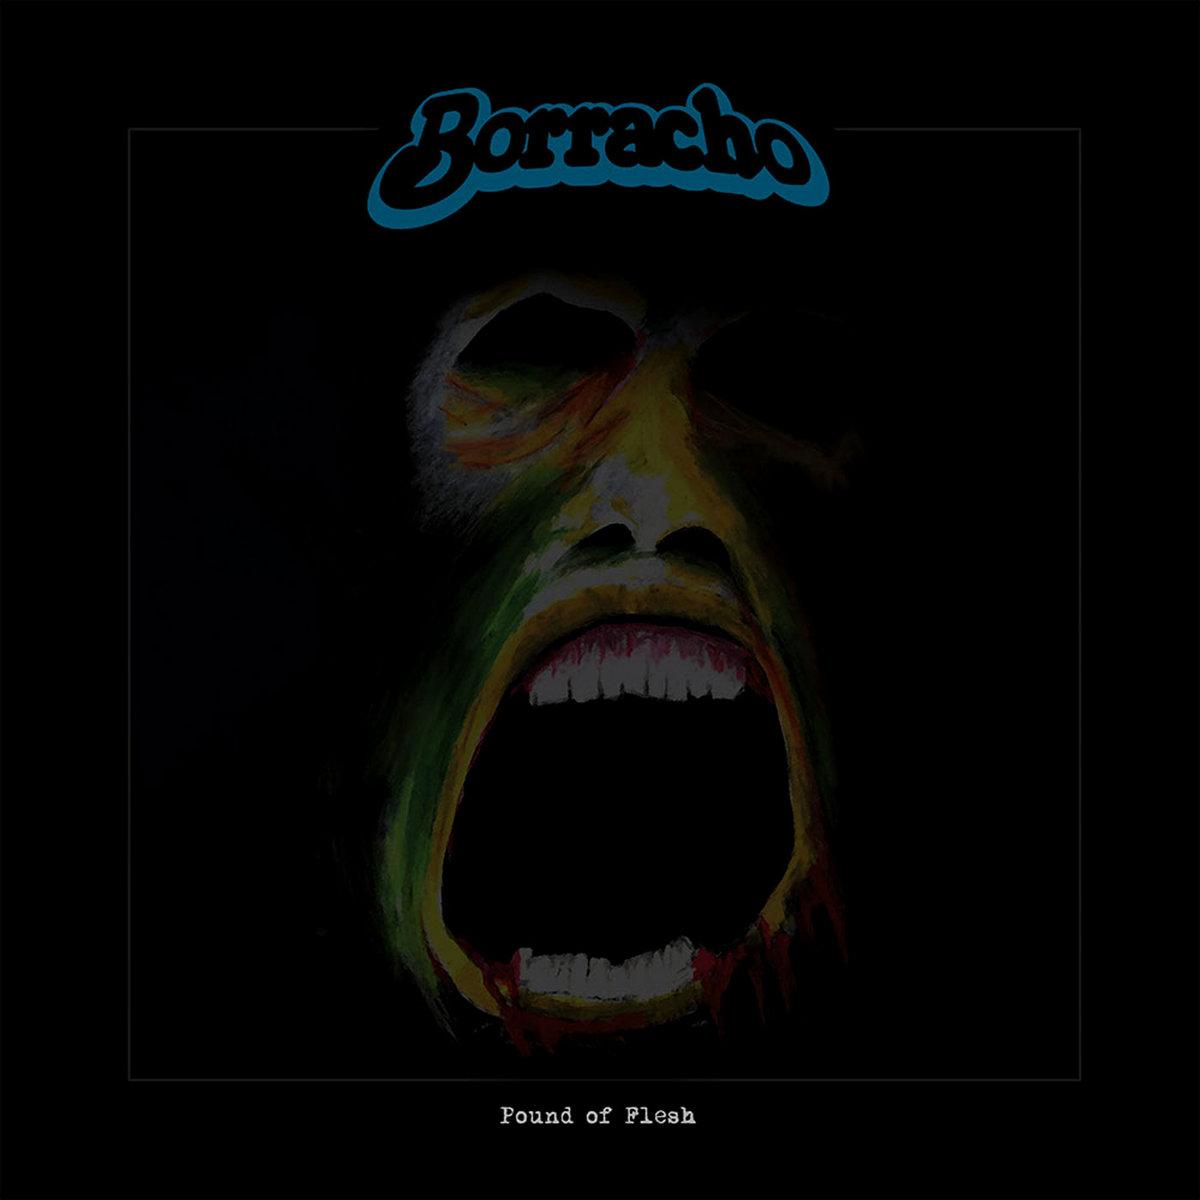 Borracho - Pound of Flesh